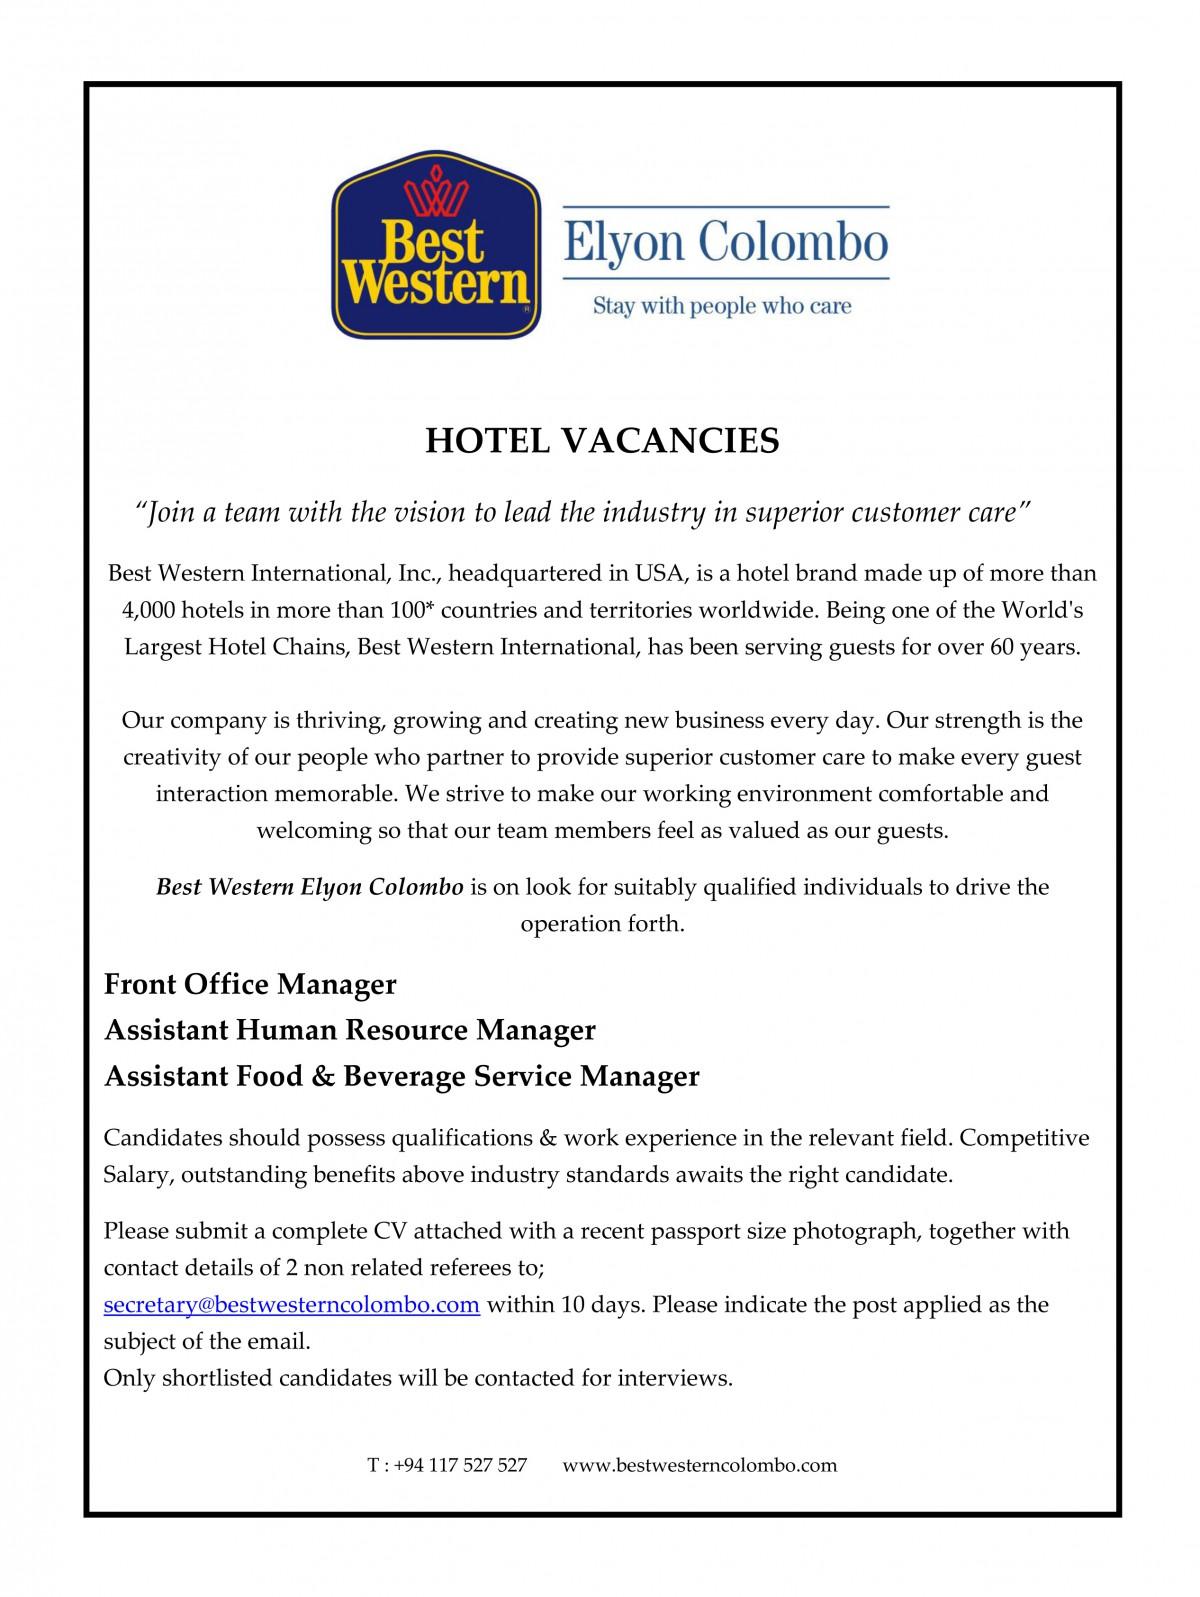 hotel vacancies at best western elyon